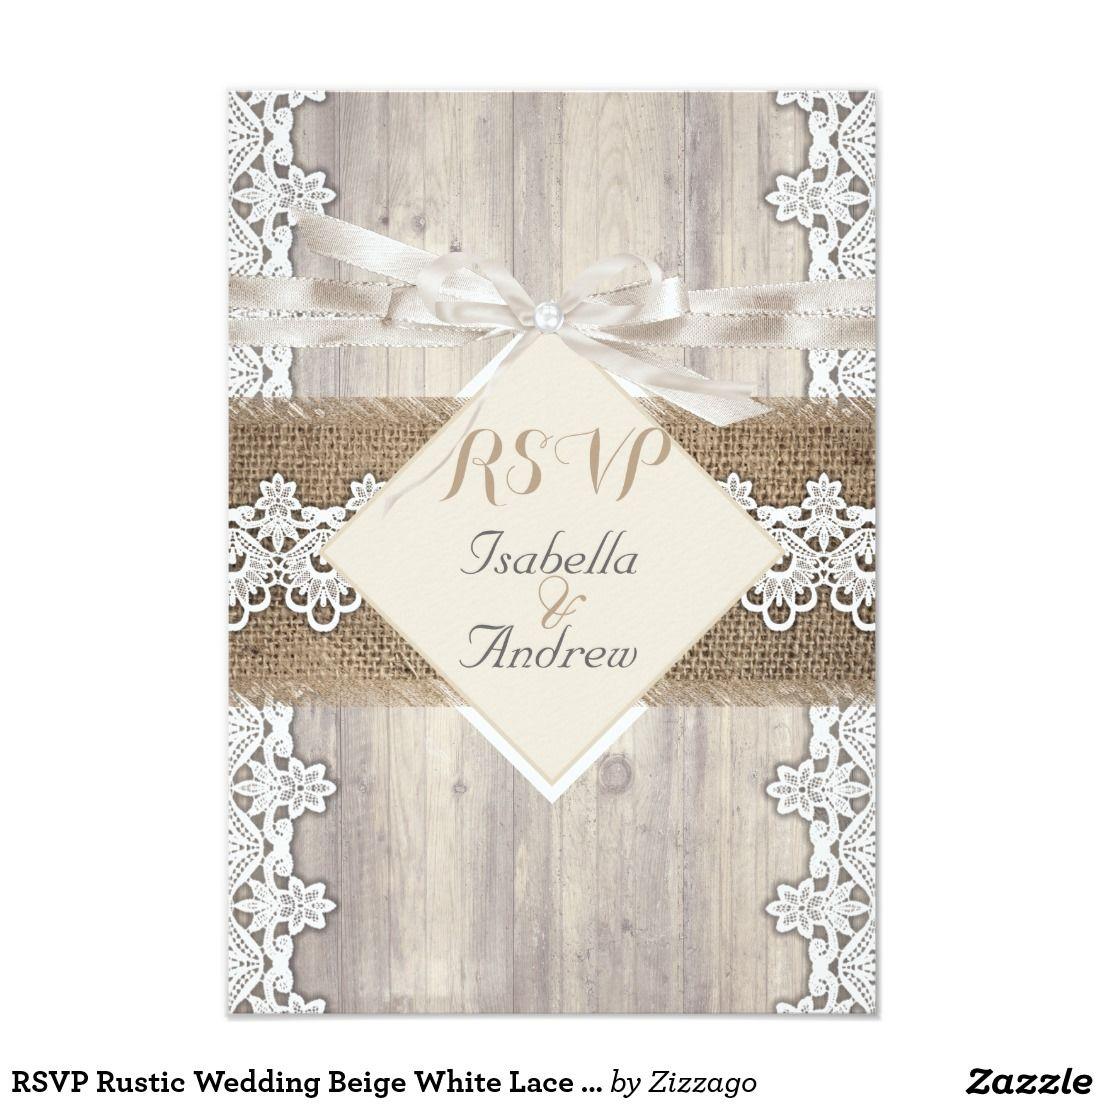 RSVP Rustic Wedding Beige White Lace Wood AB | Lace Wedding ...